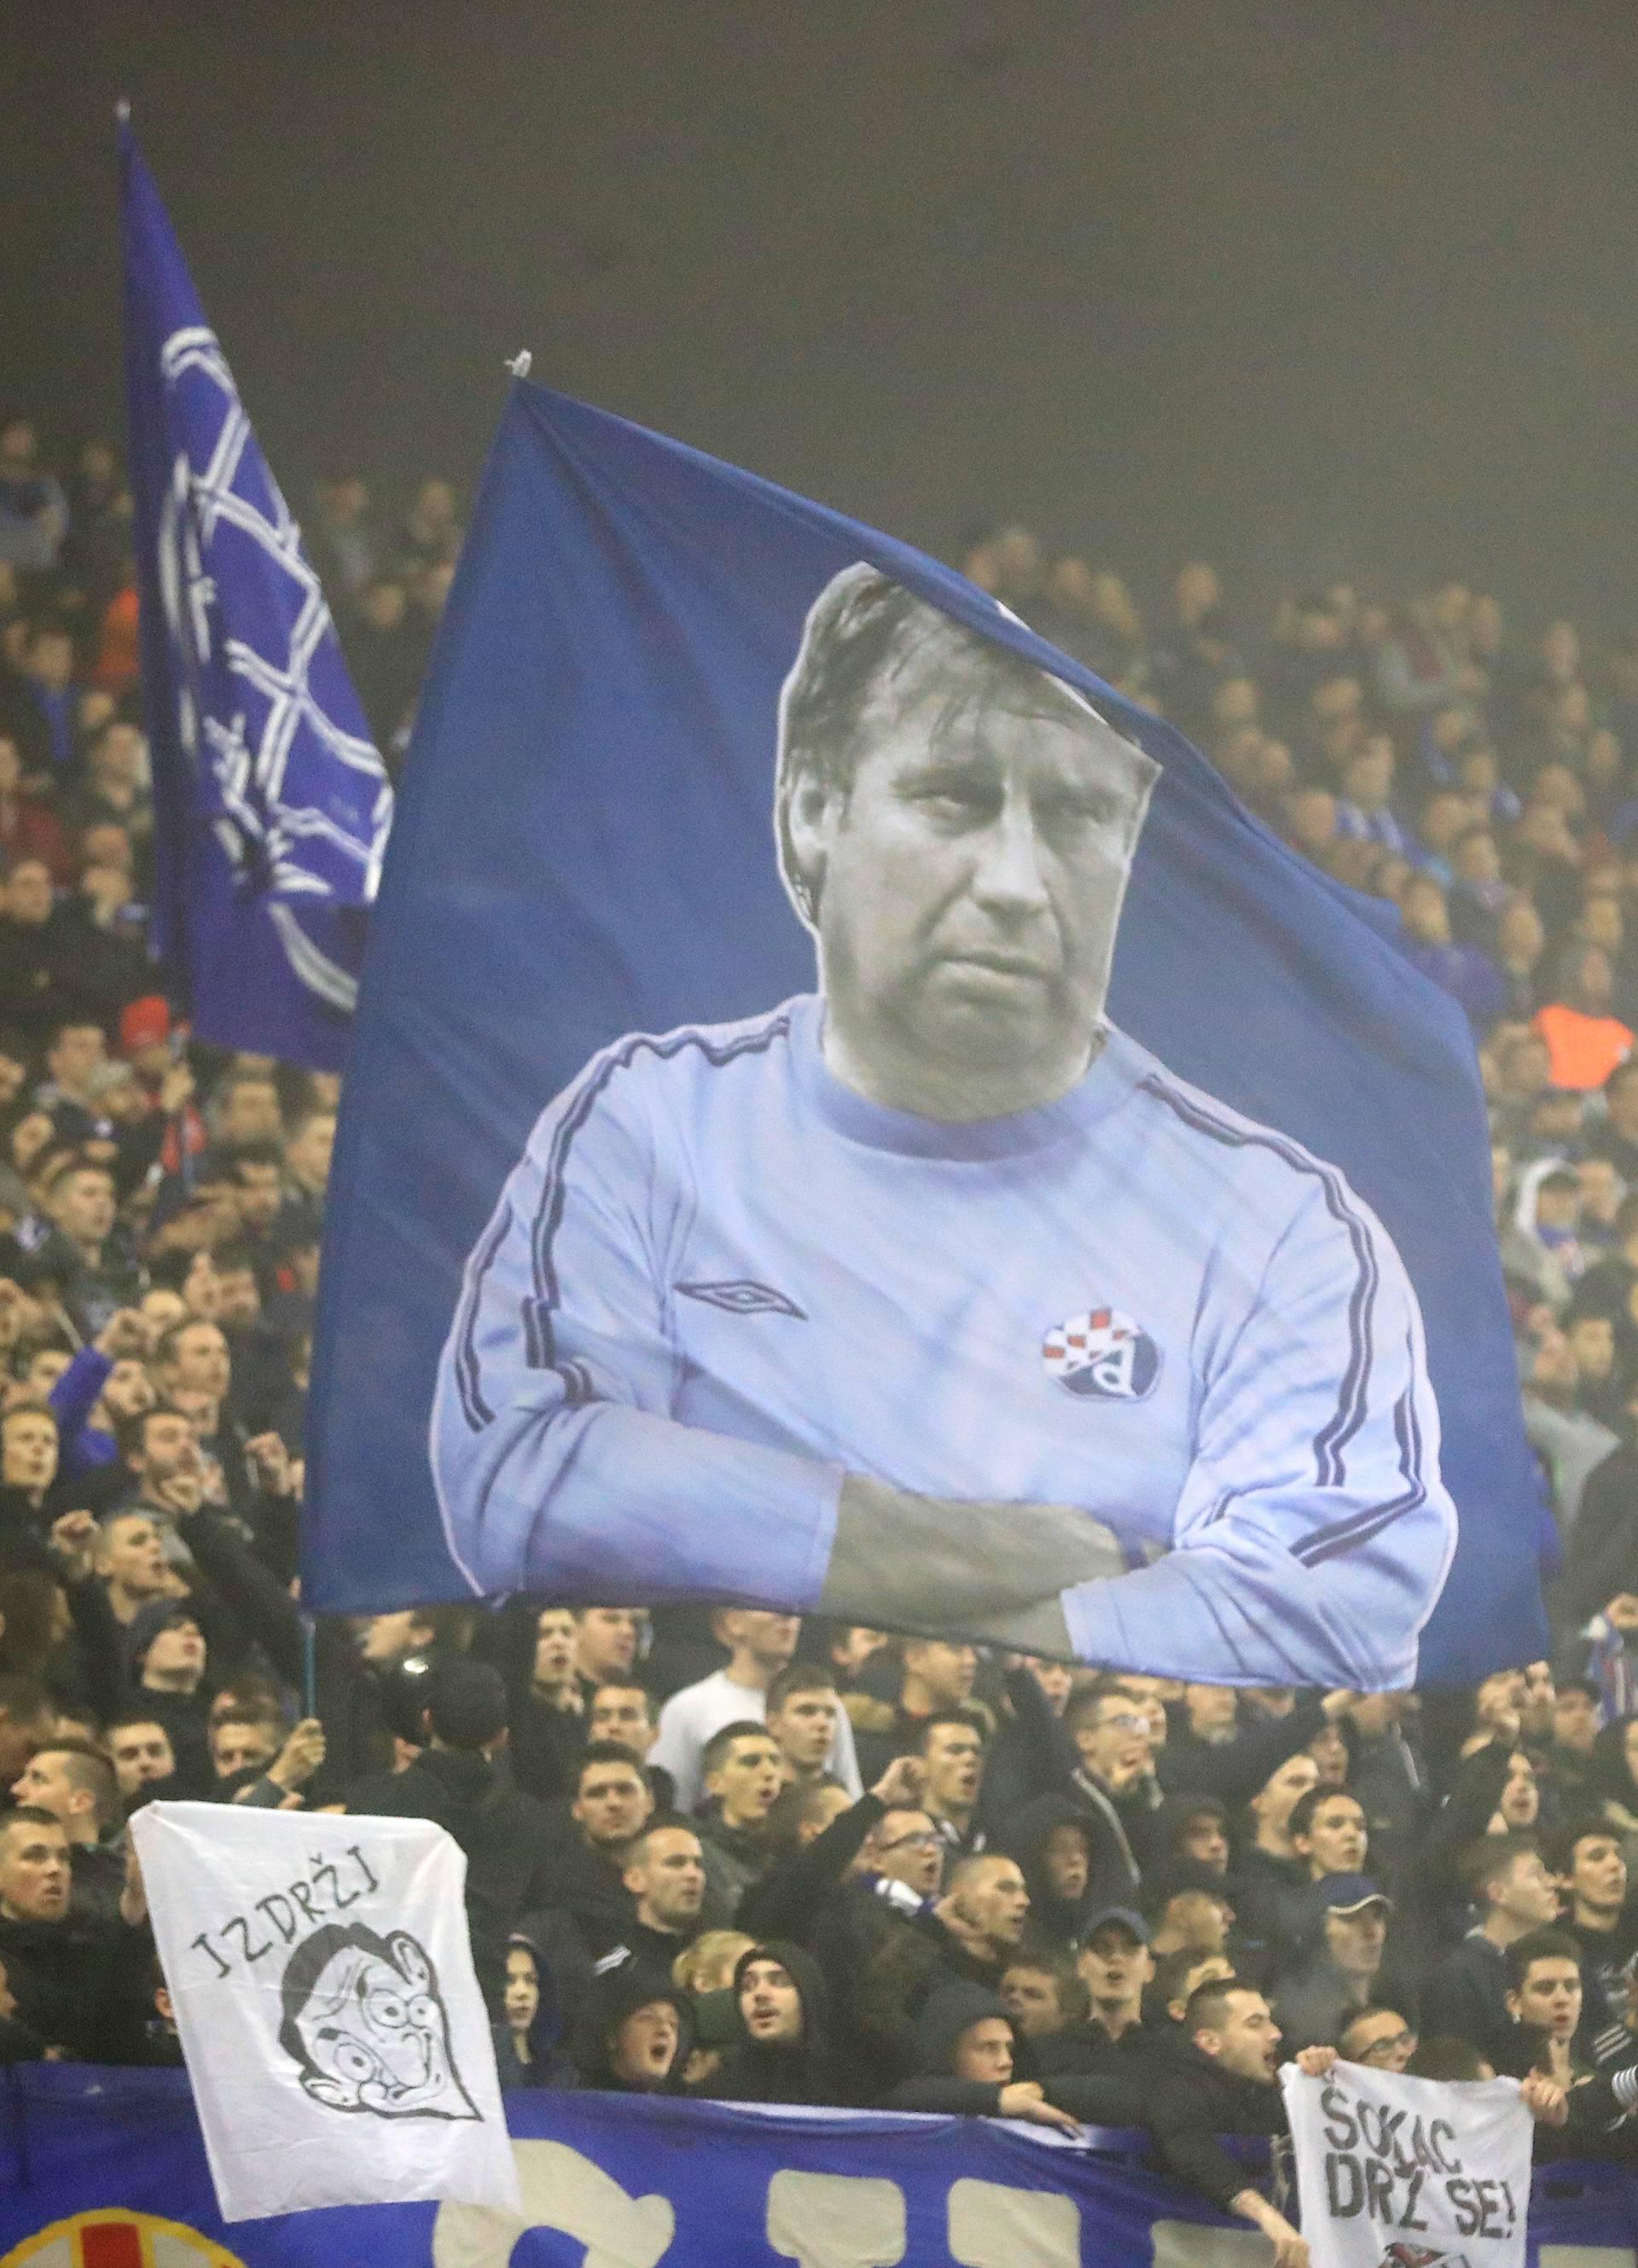 Zagreb: Atmosfera na utakmici Europske lige između Dinama i Spartak Trnave